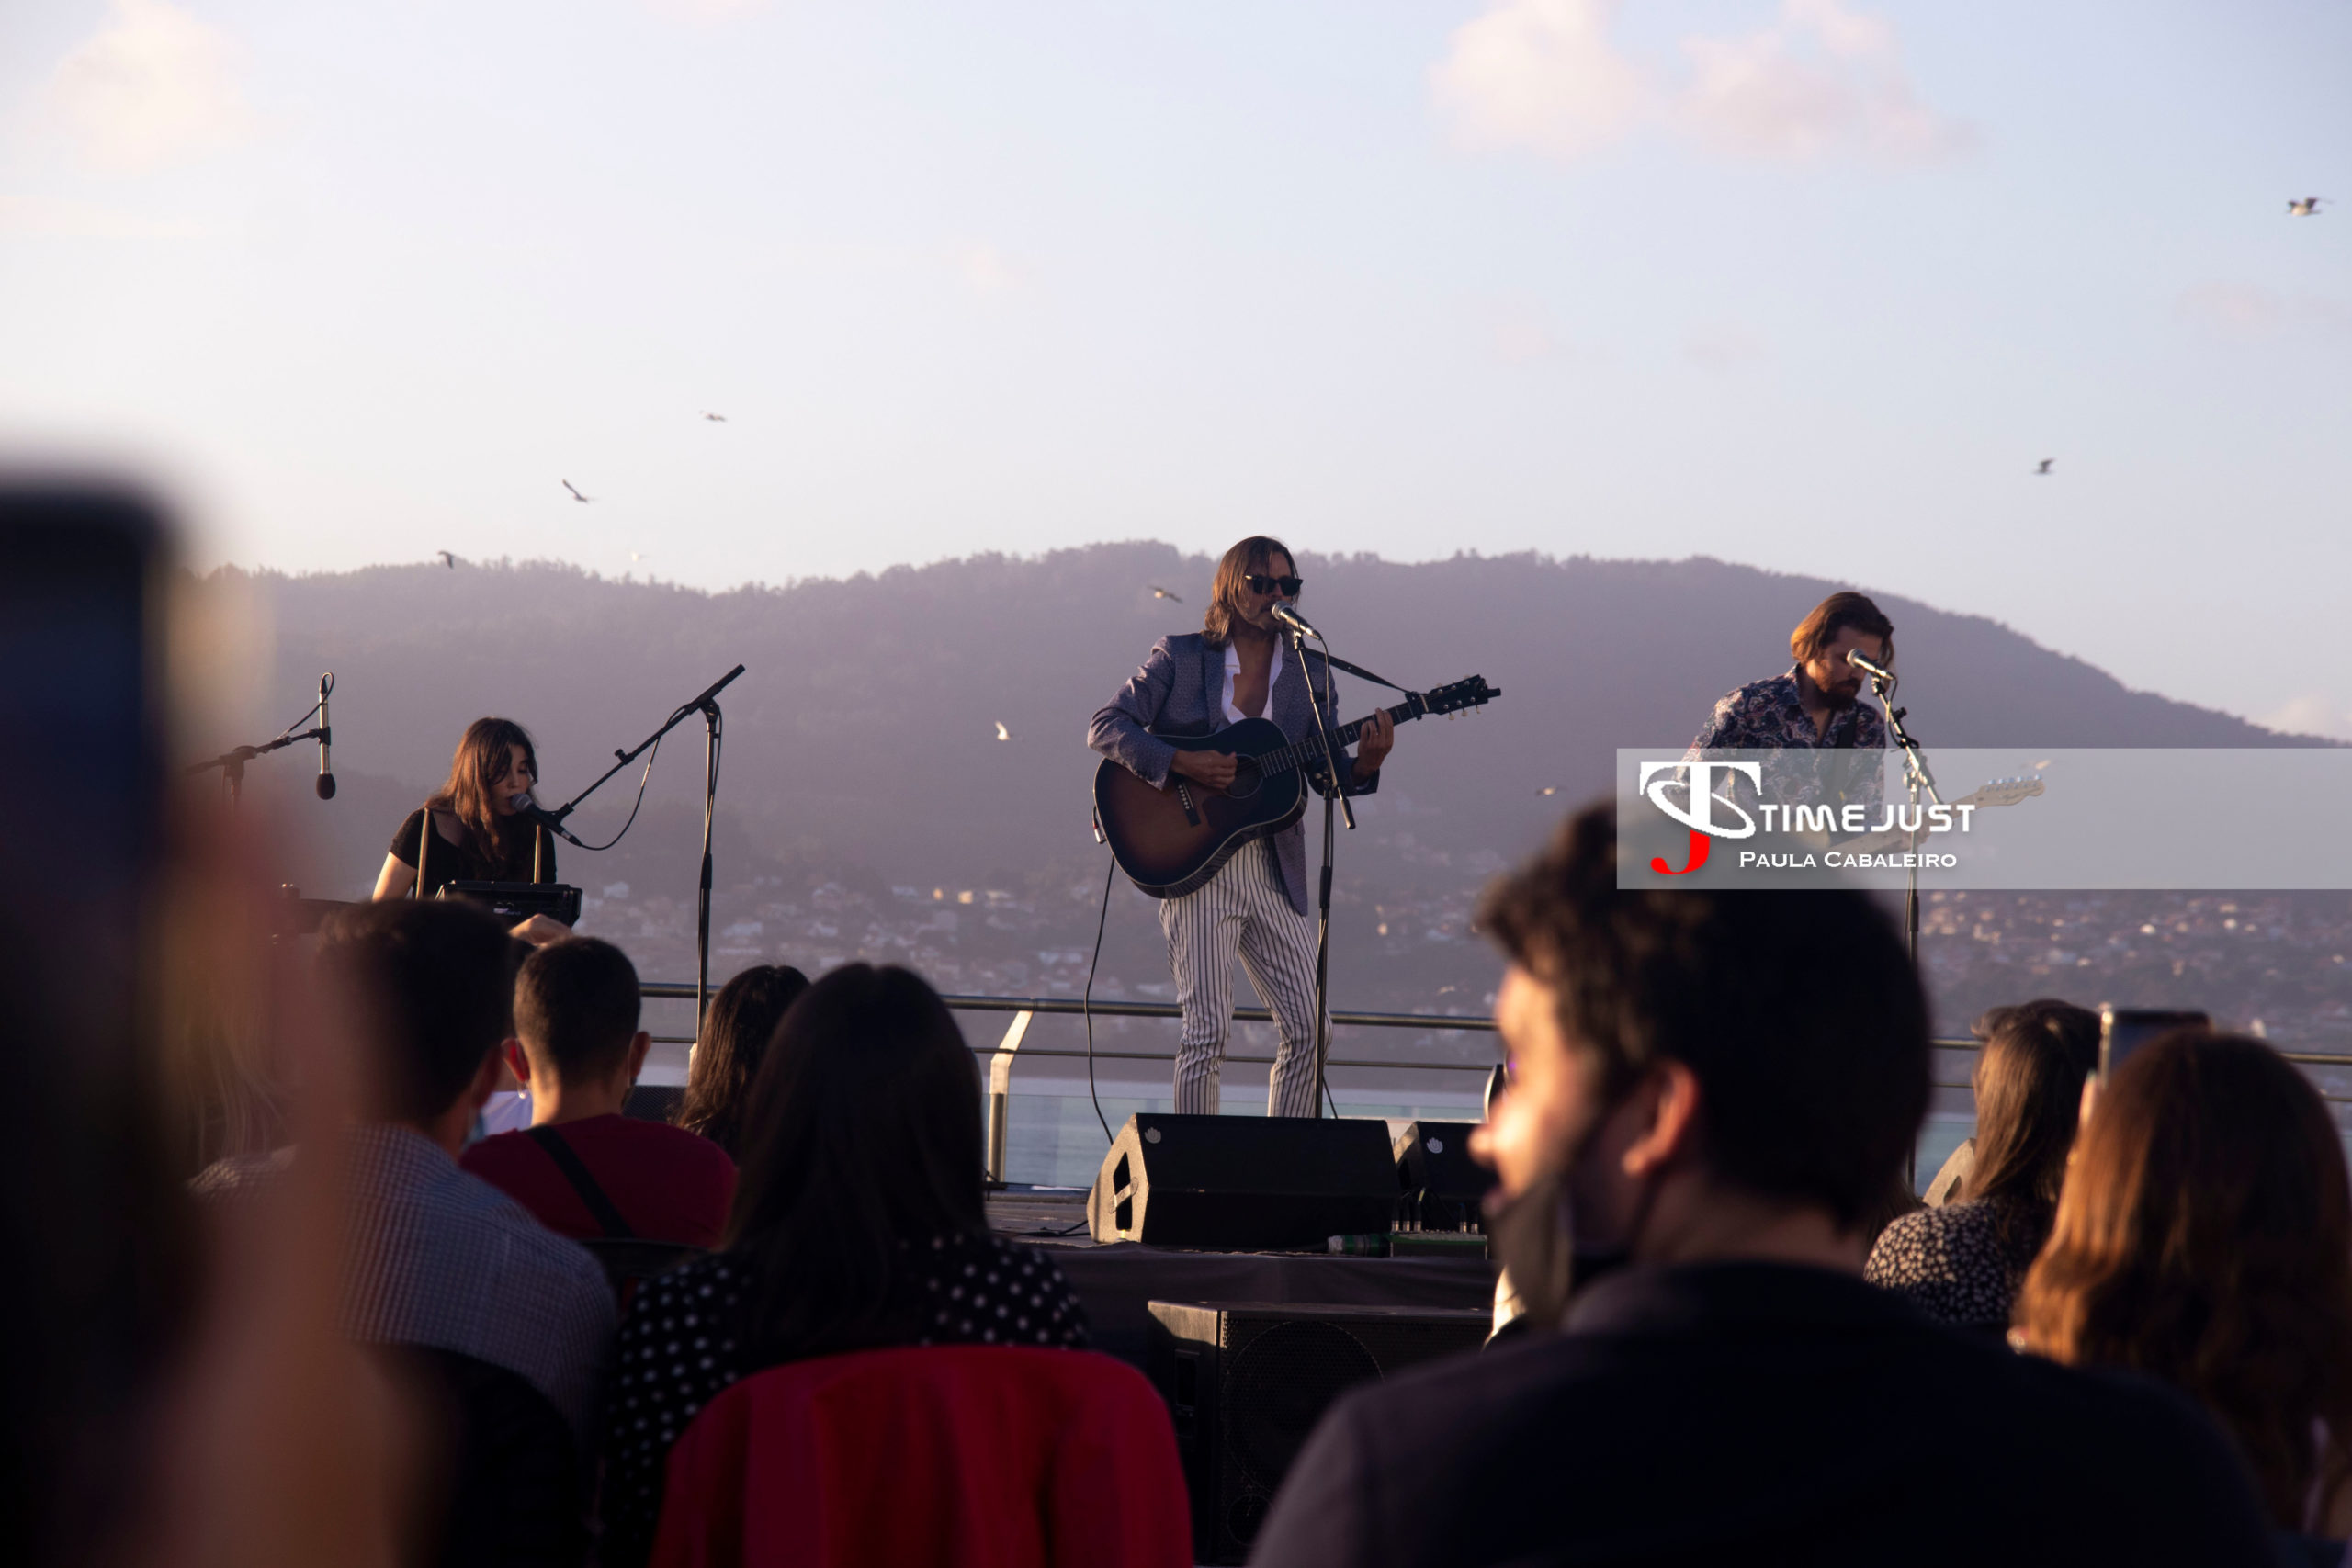 Pol 3.14 en el Festival TerraCeo en Vigo. Foto: Paula Cabaleiro